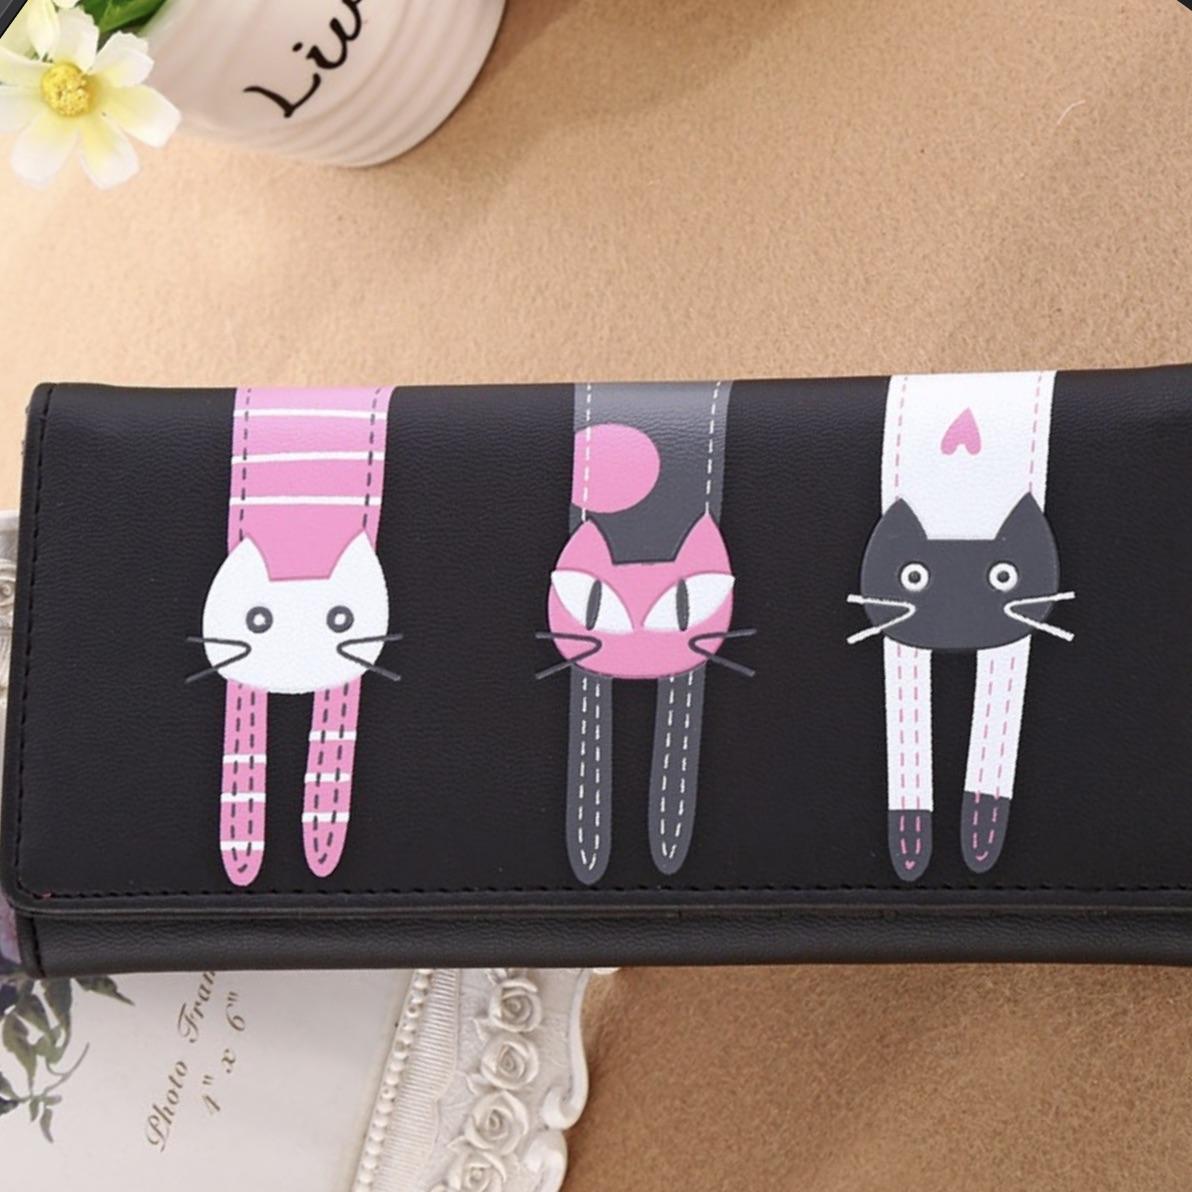 Porte cartes portefeuille chats boho boheme chic wallet0203